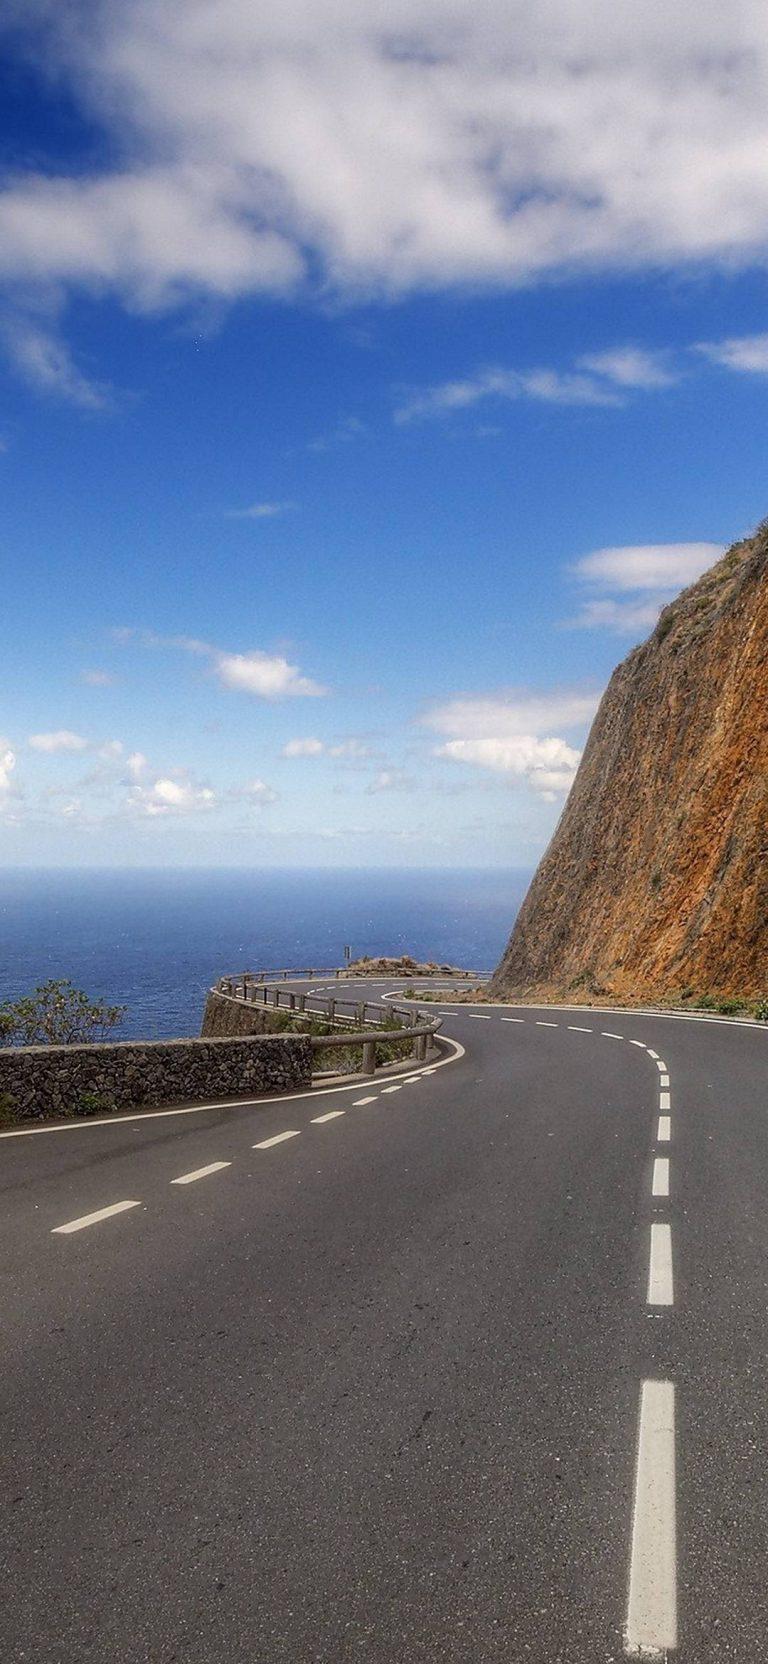 Road Mountain Hill 1080x2340 768x1664